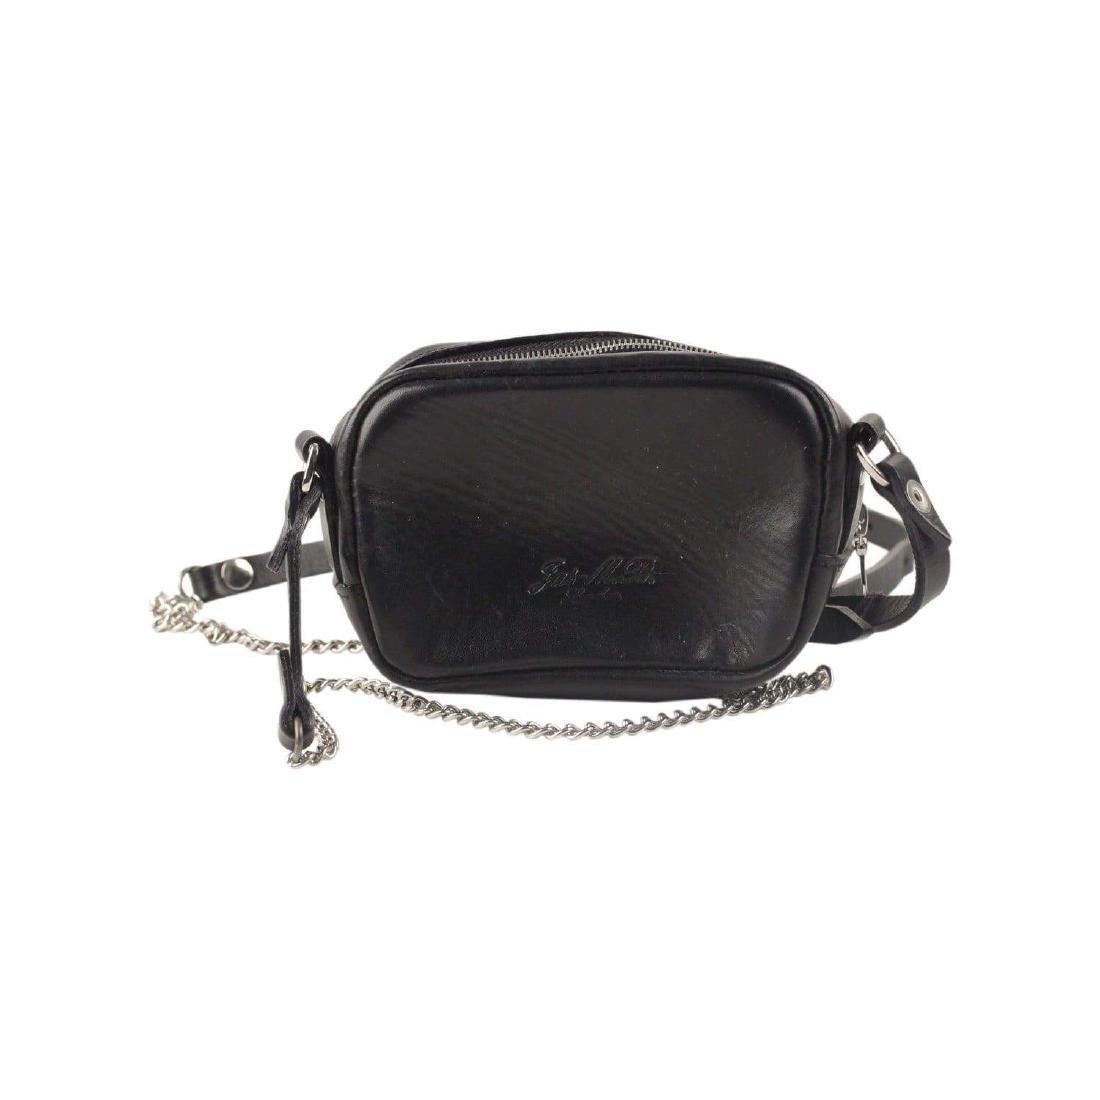 Jas M.B. London Mini Crossbody Messenger Bag